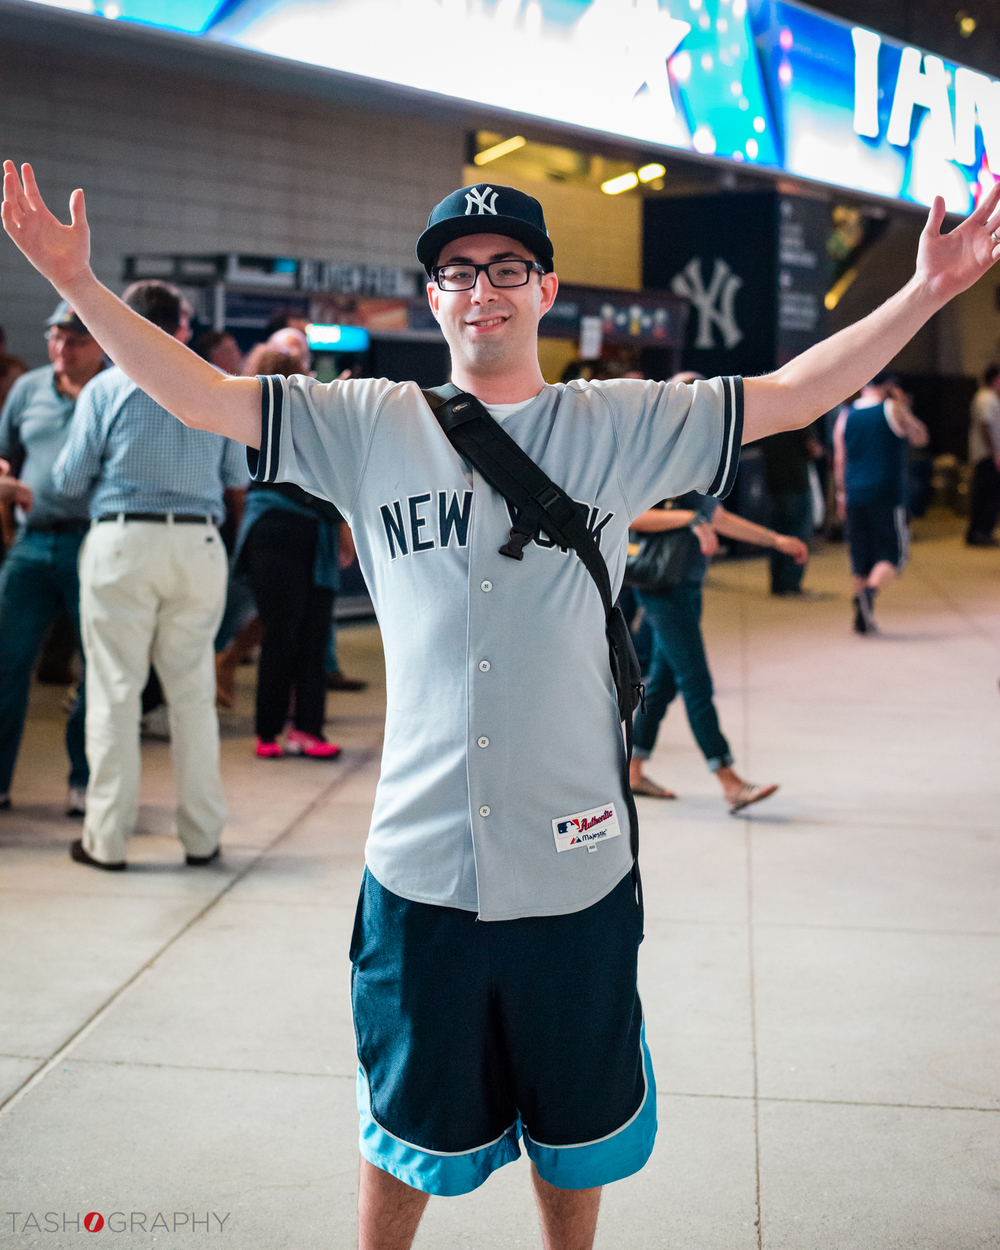 Yankees-090314-59.jpg